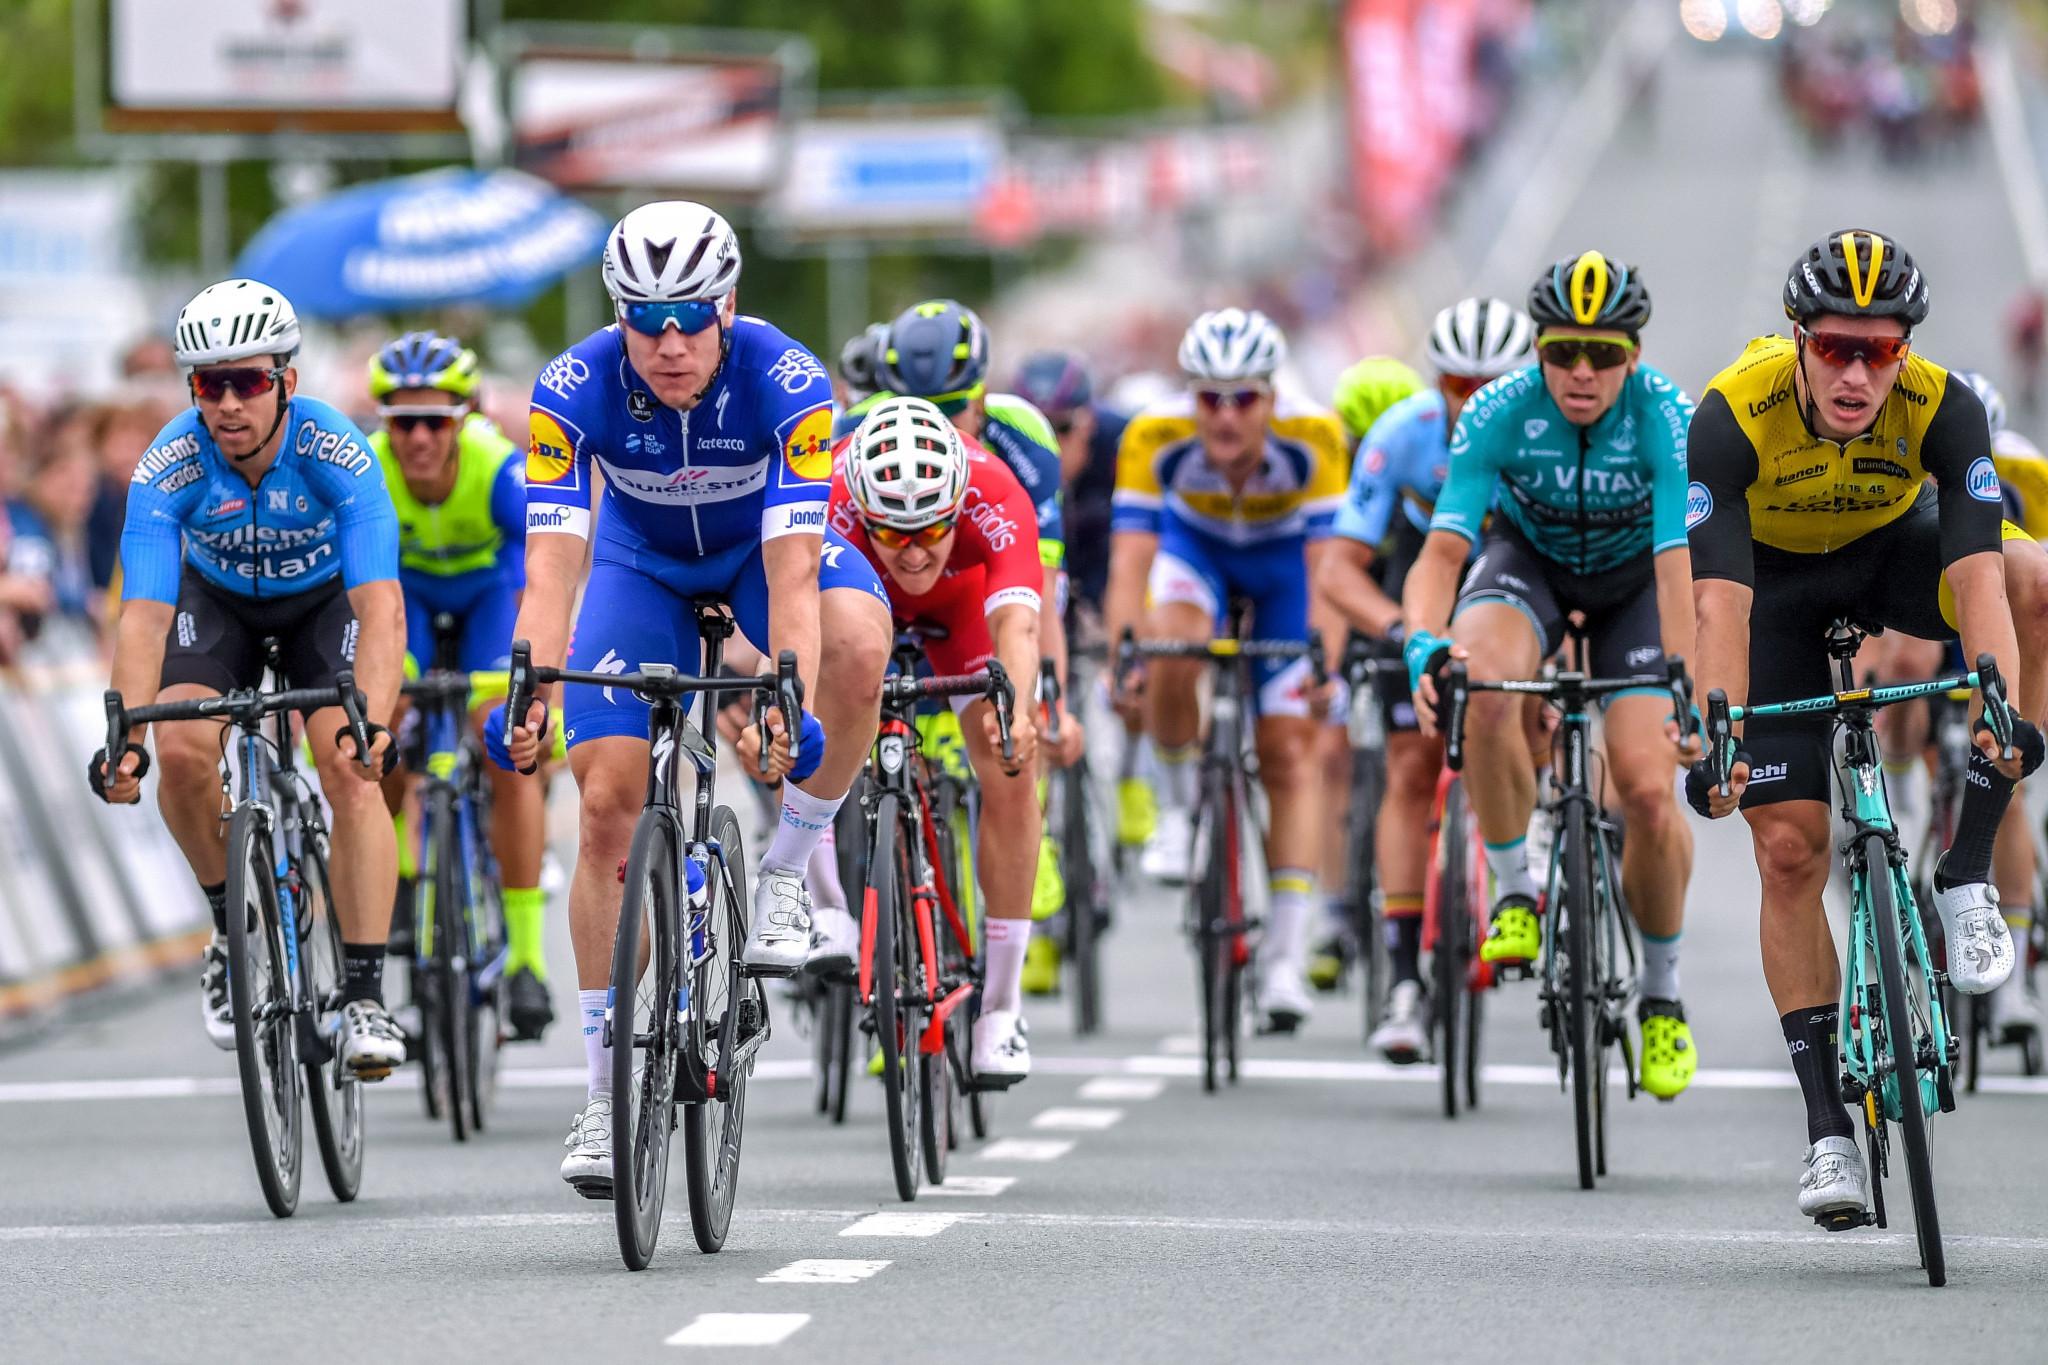 Jakobsen takes opening stage of BinckBank Tour as Vos wins in Vårgårda